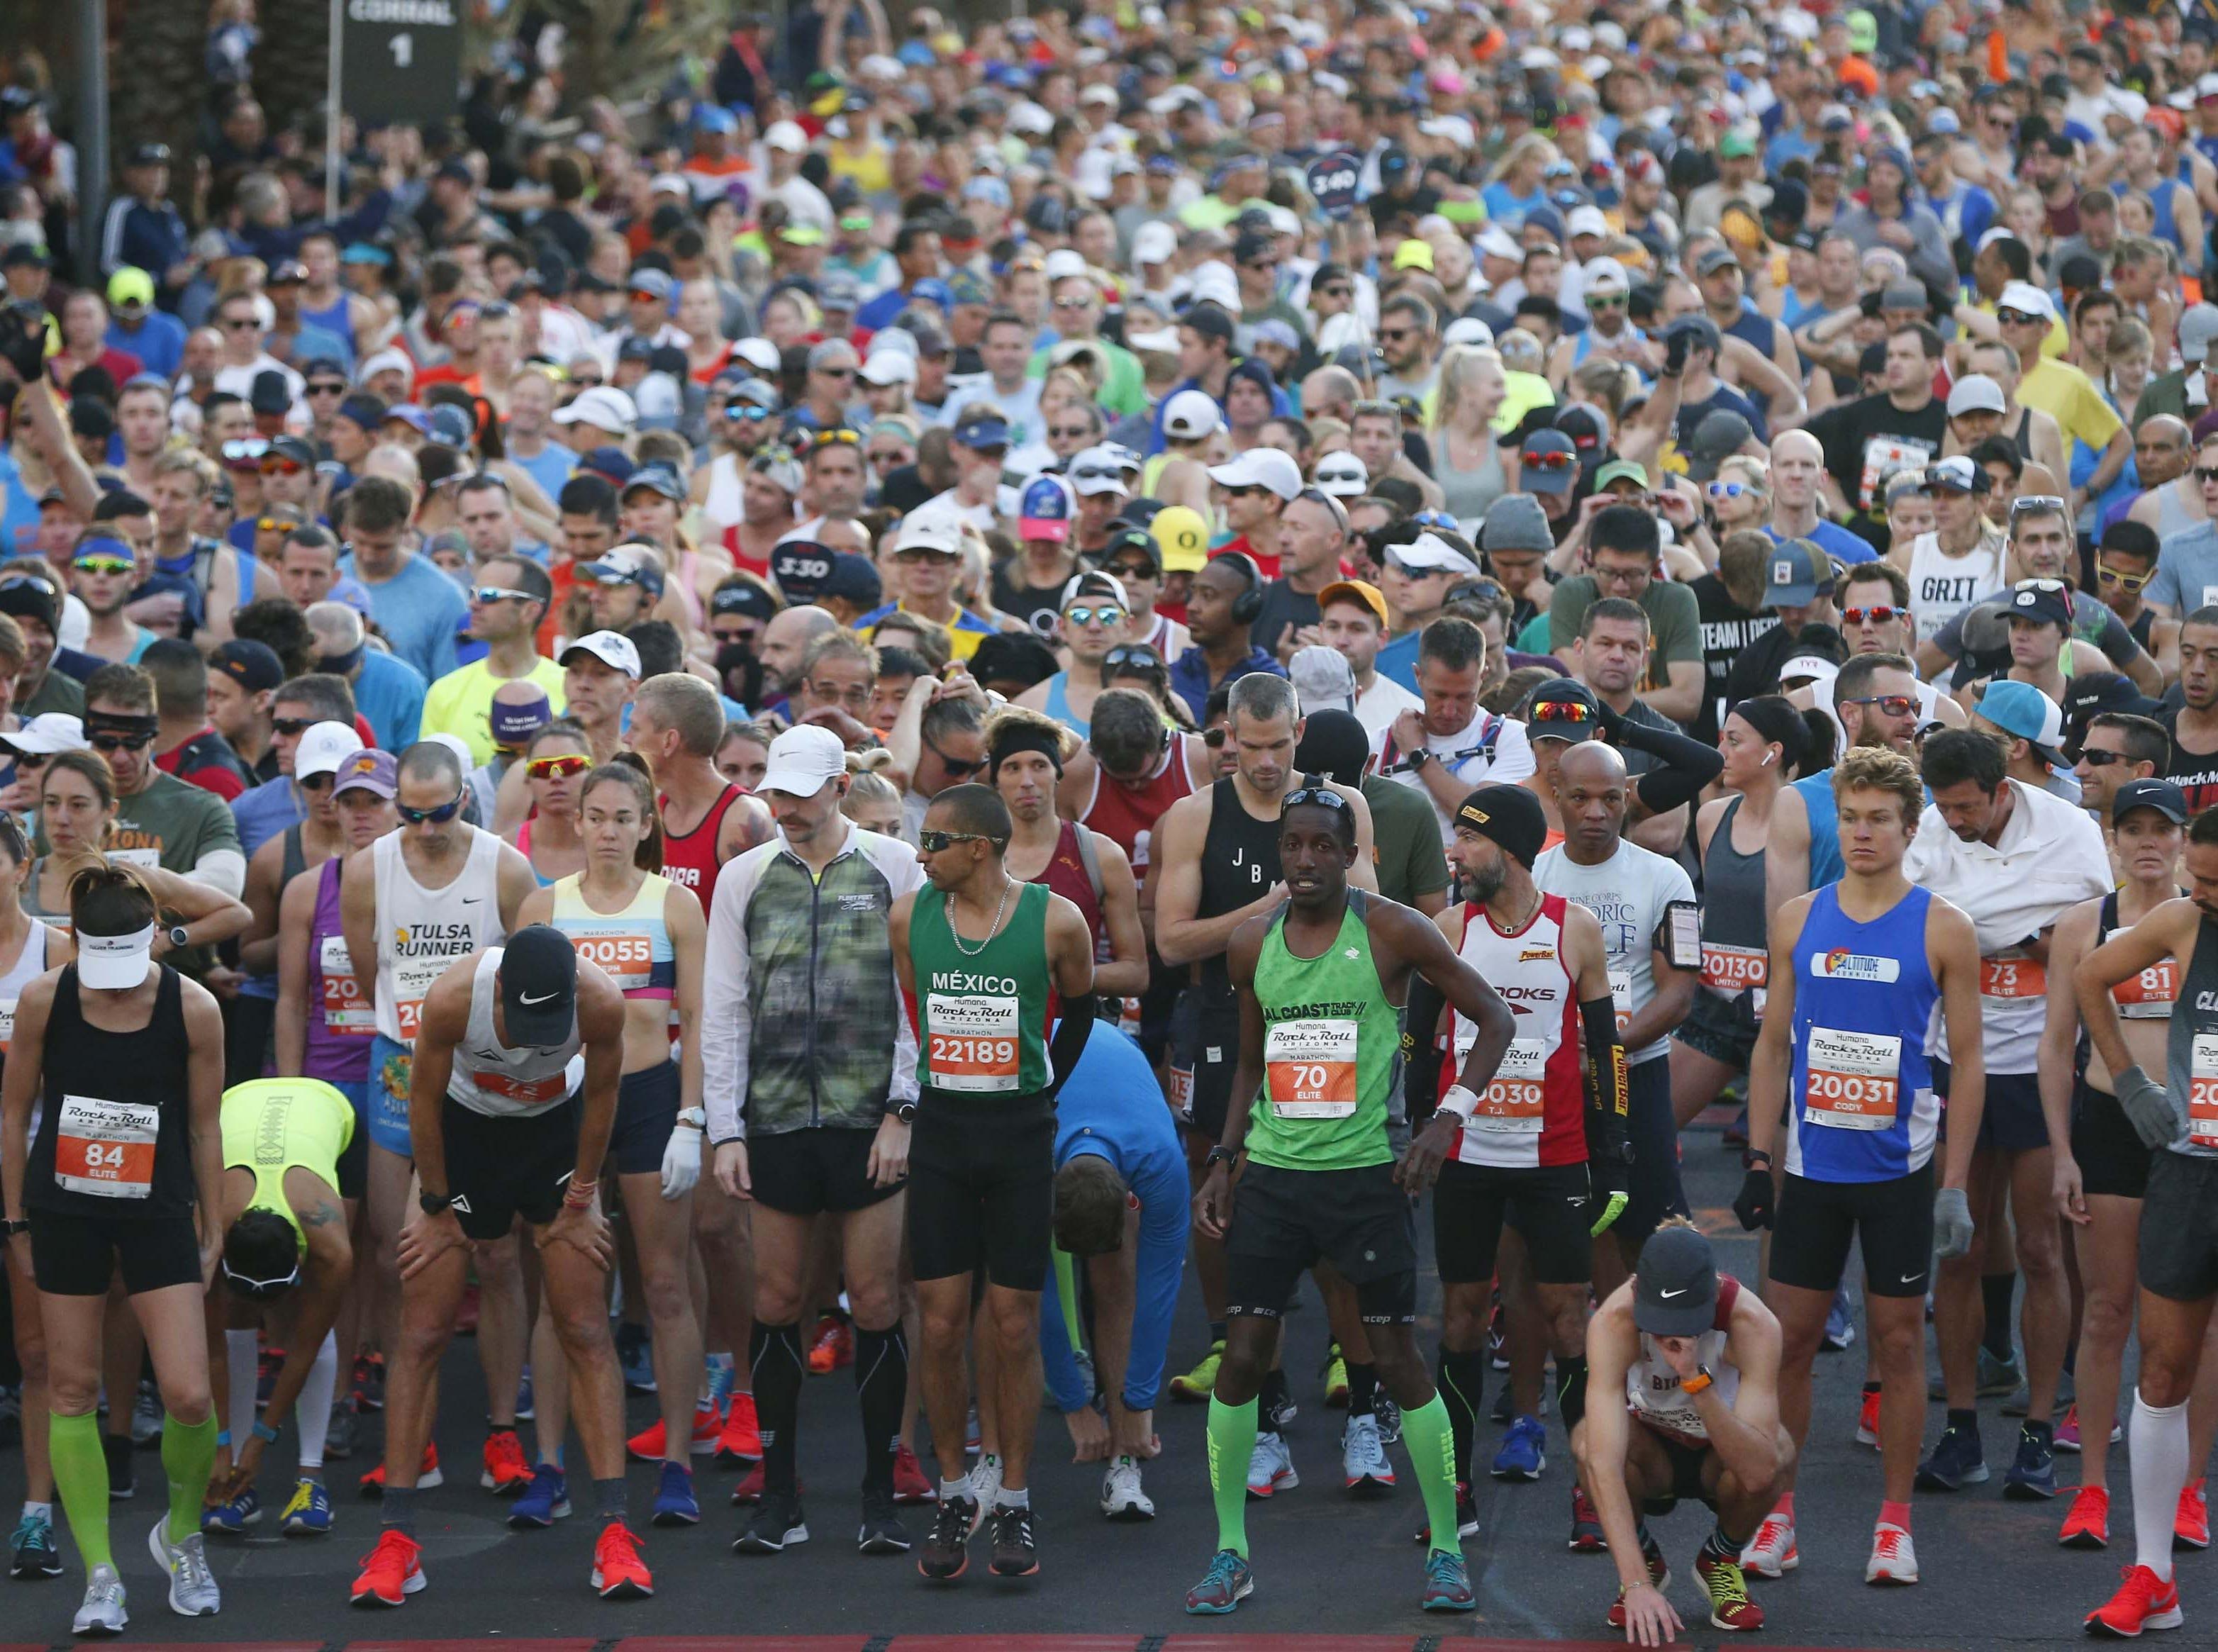 Runners wait for the start of the Rock 'n' Roll Marathon in Phoenix, Jan. 20, 2019.